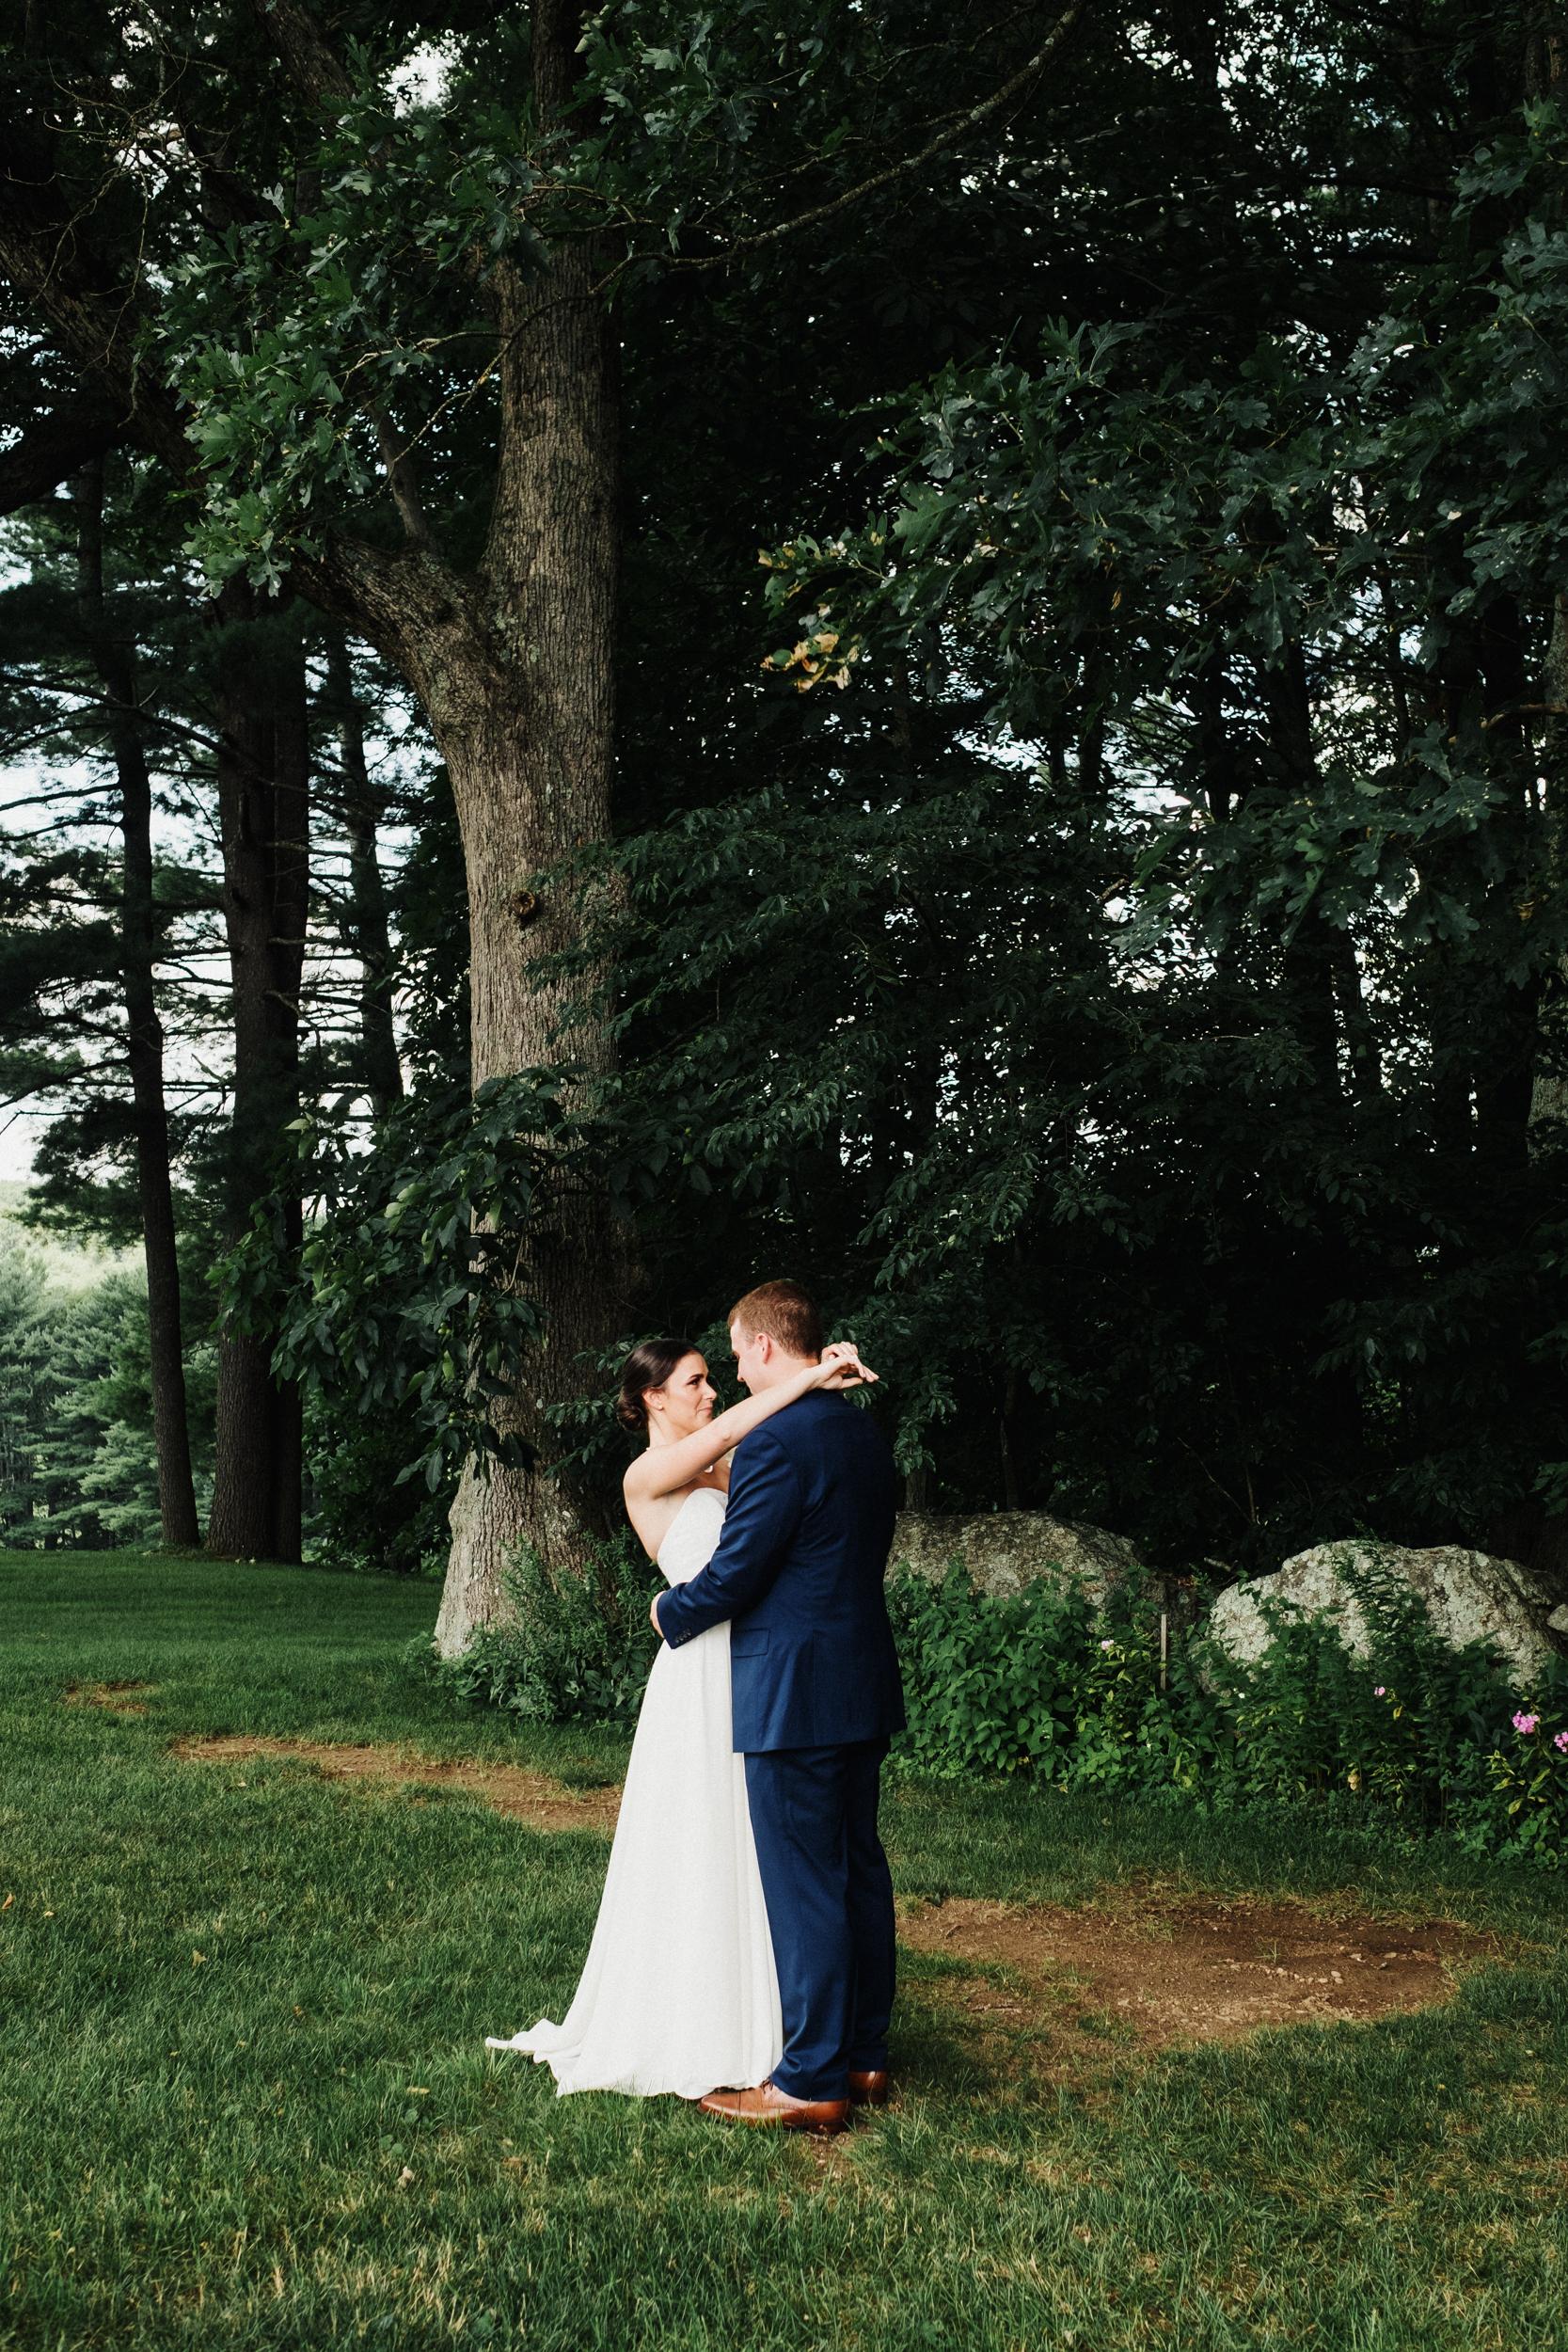 Wedding_Francis_Boucher_zukas_farm_2018-24.jpg